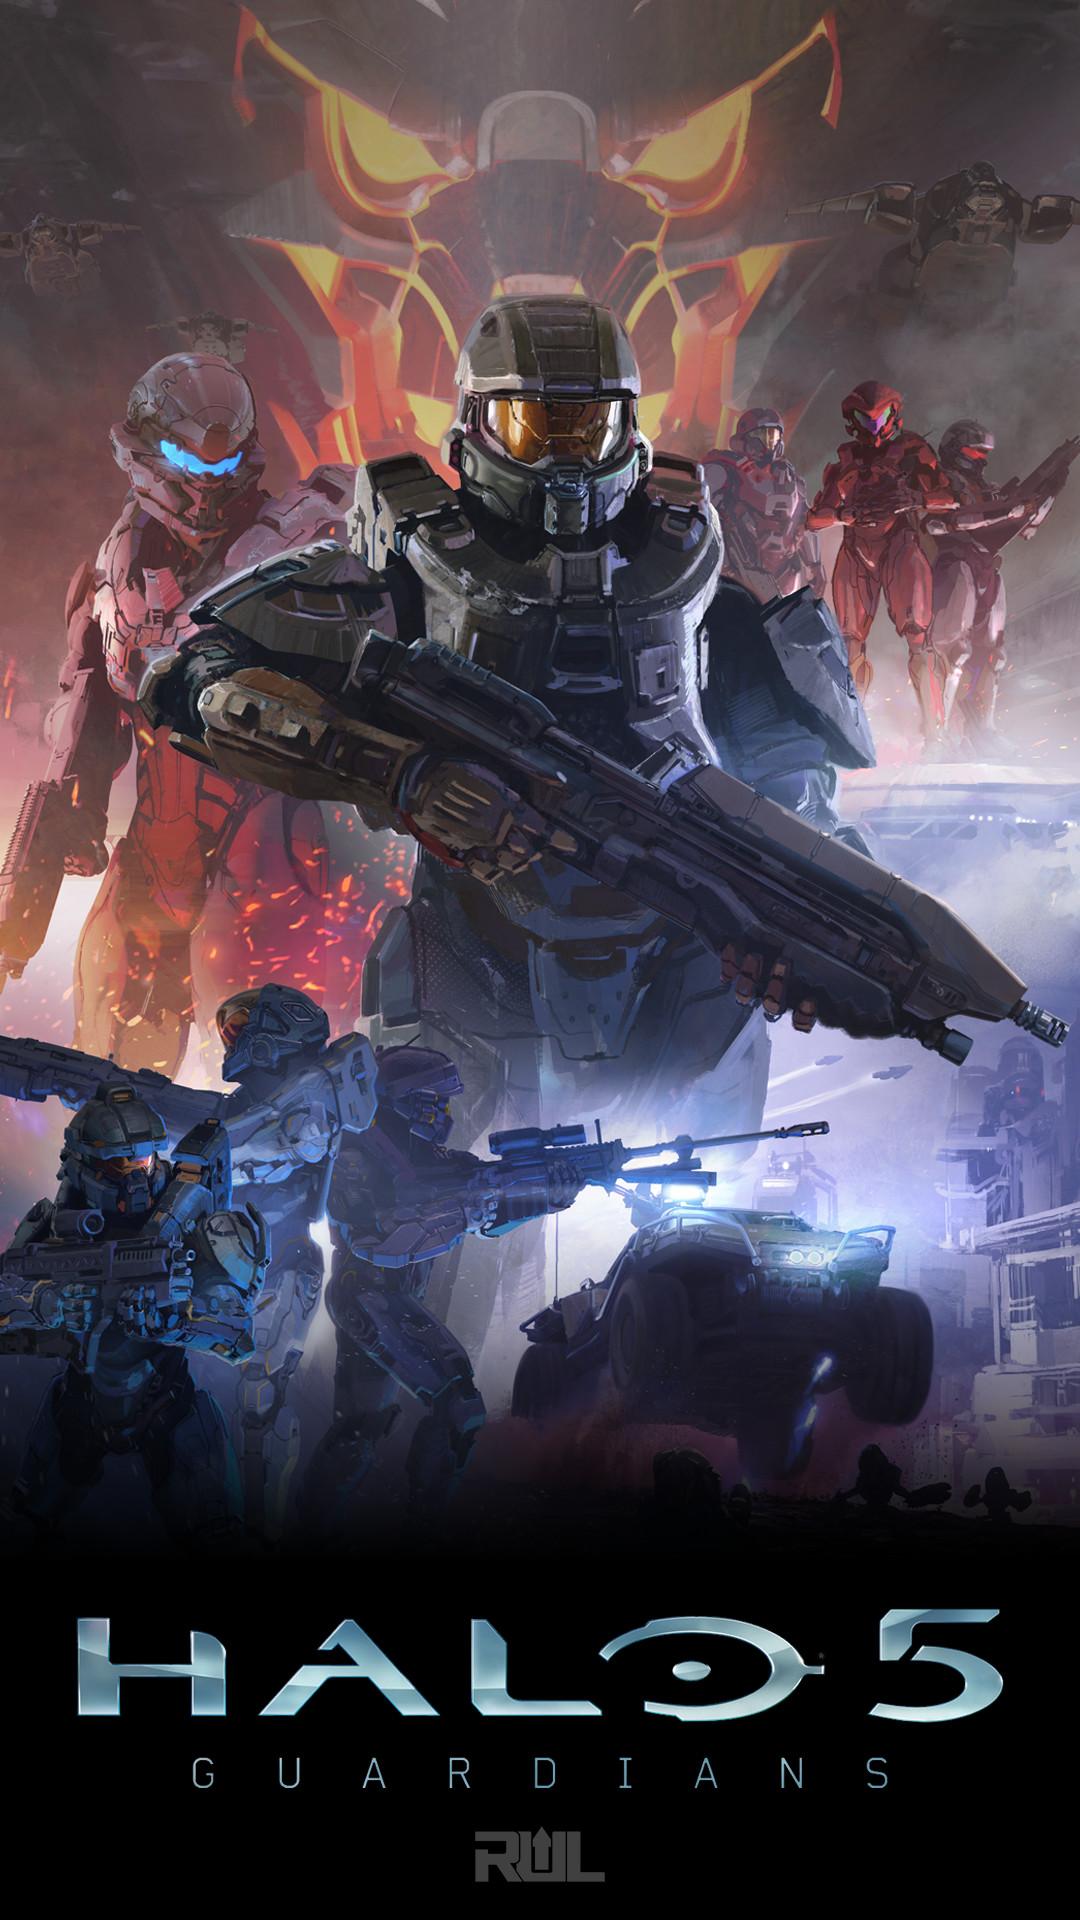 Halo 5 wallpaper 1080p 74 images - Halo 5 guardians wallpaper 1920x1080 ...